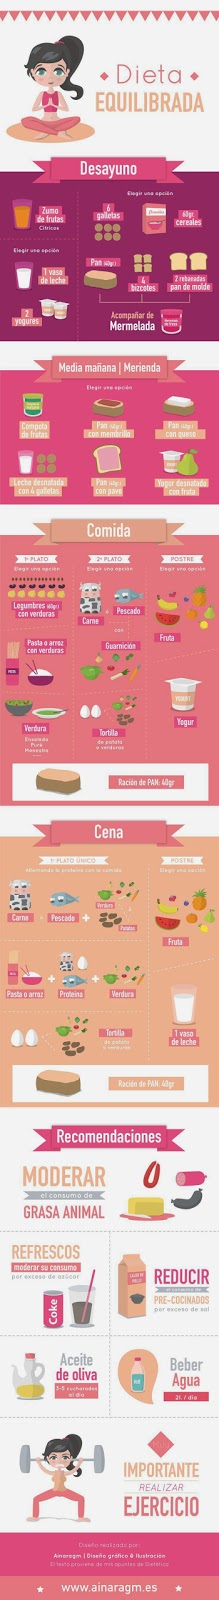 Dieta diaria saludable